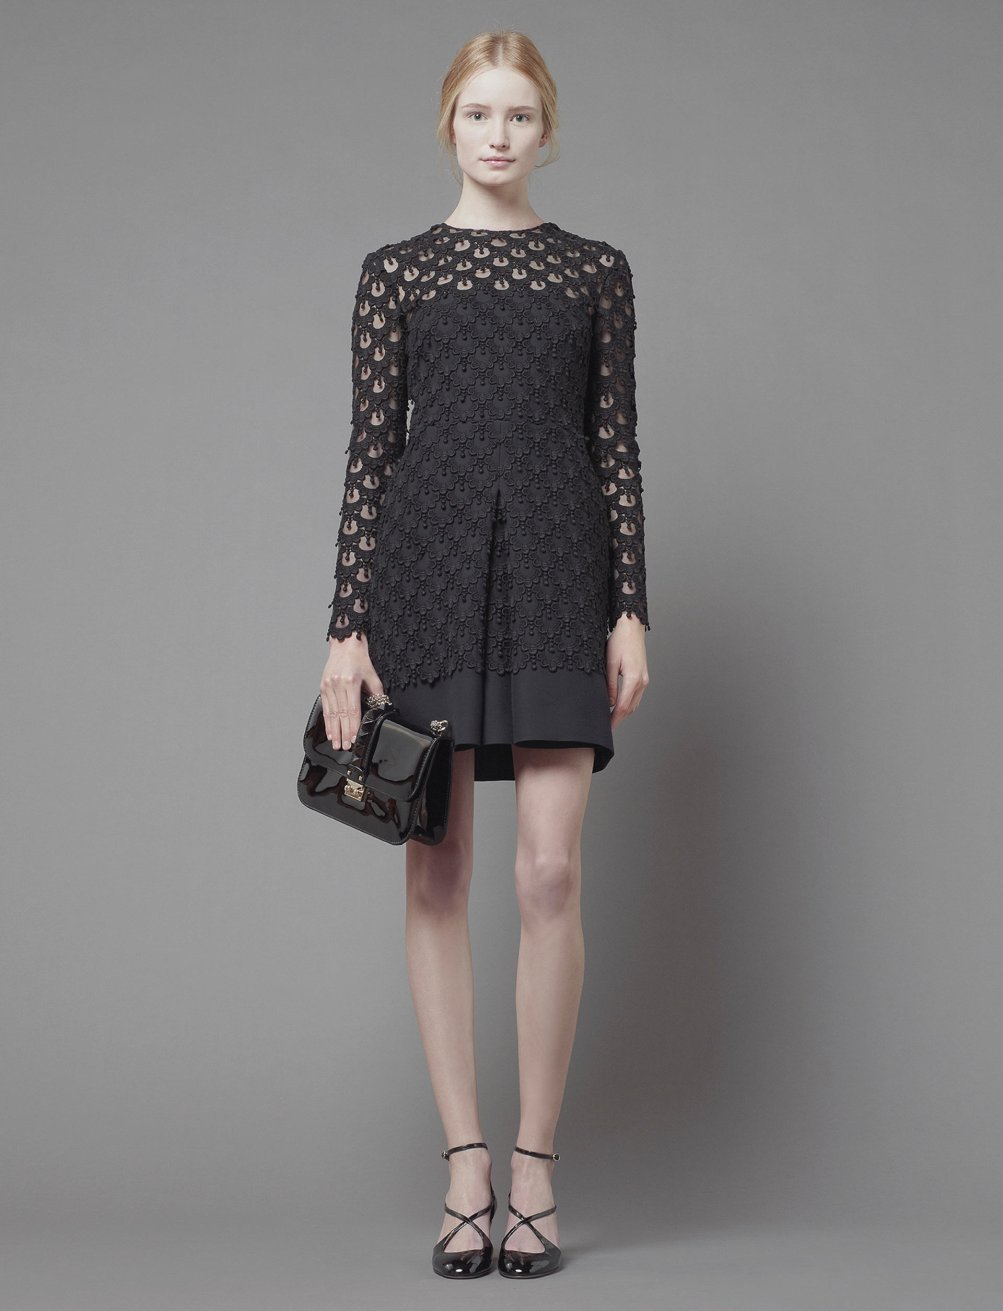 14666-ready-to-wear-fall-2013